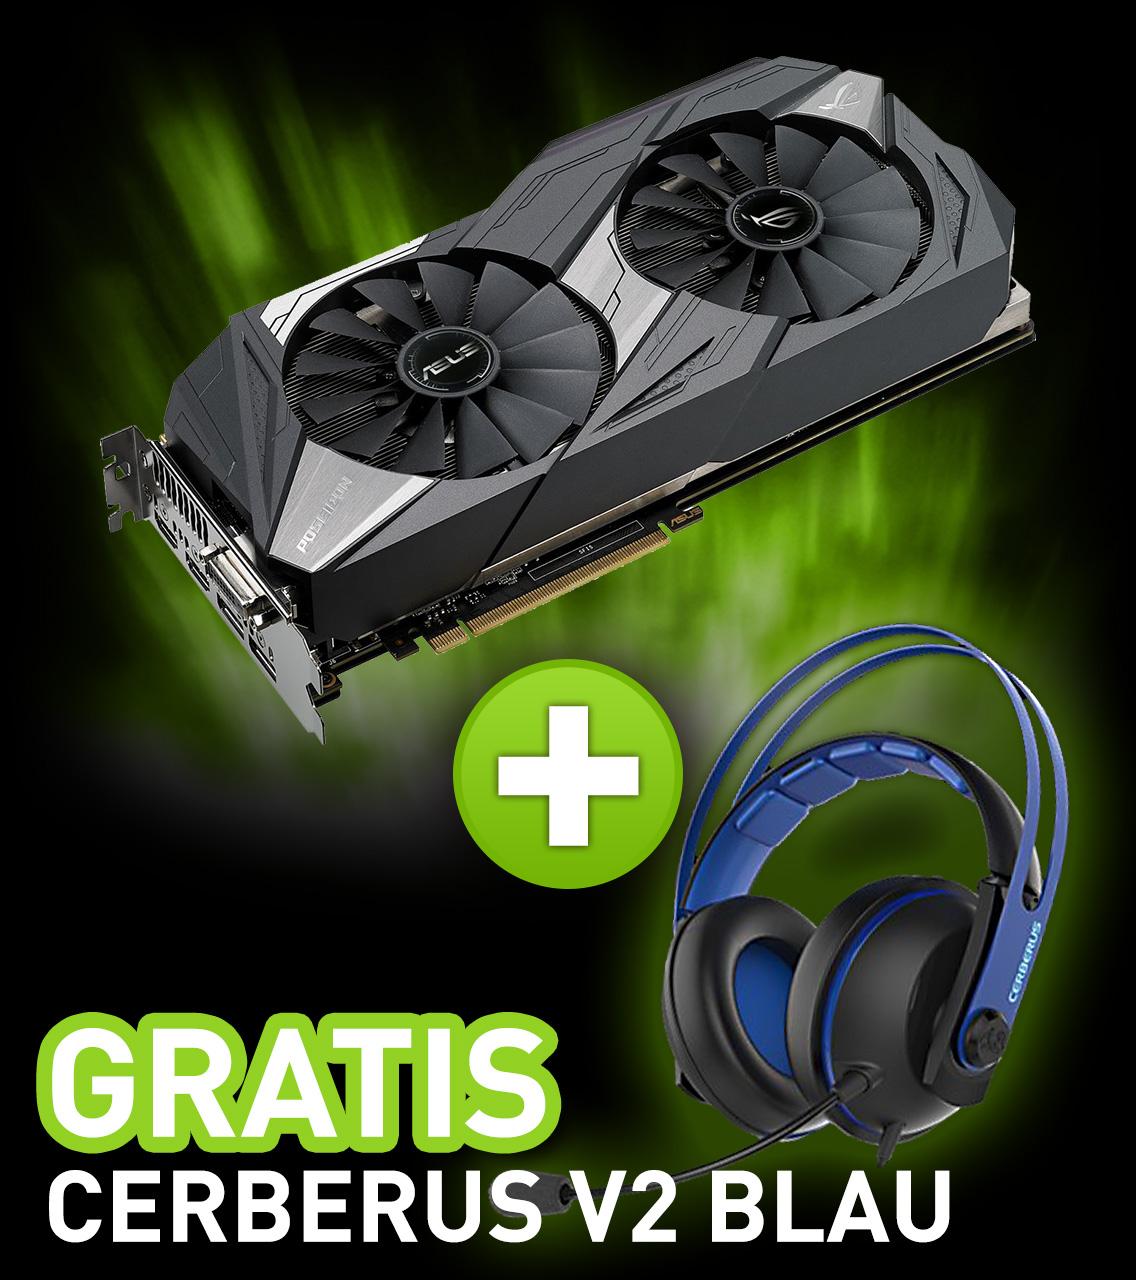 11GB Asus GeForce GTX 1080 Ti ROG Poseidon Hybrid PCIe 3.0 x16 (Retail)